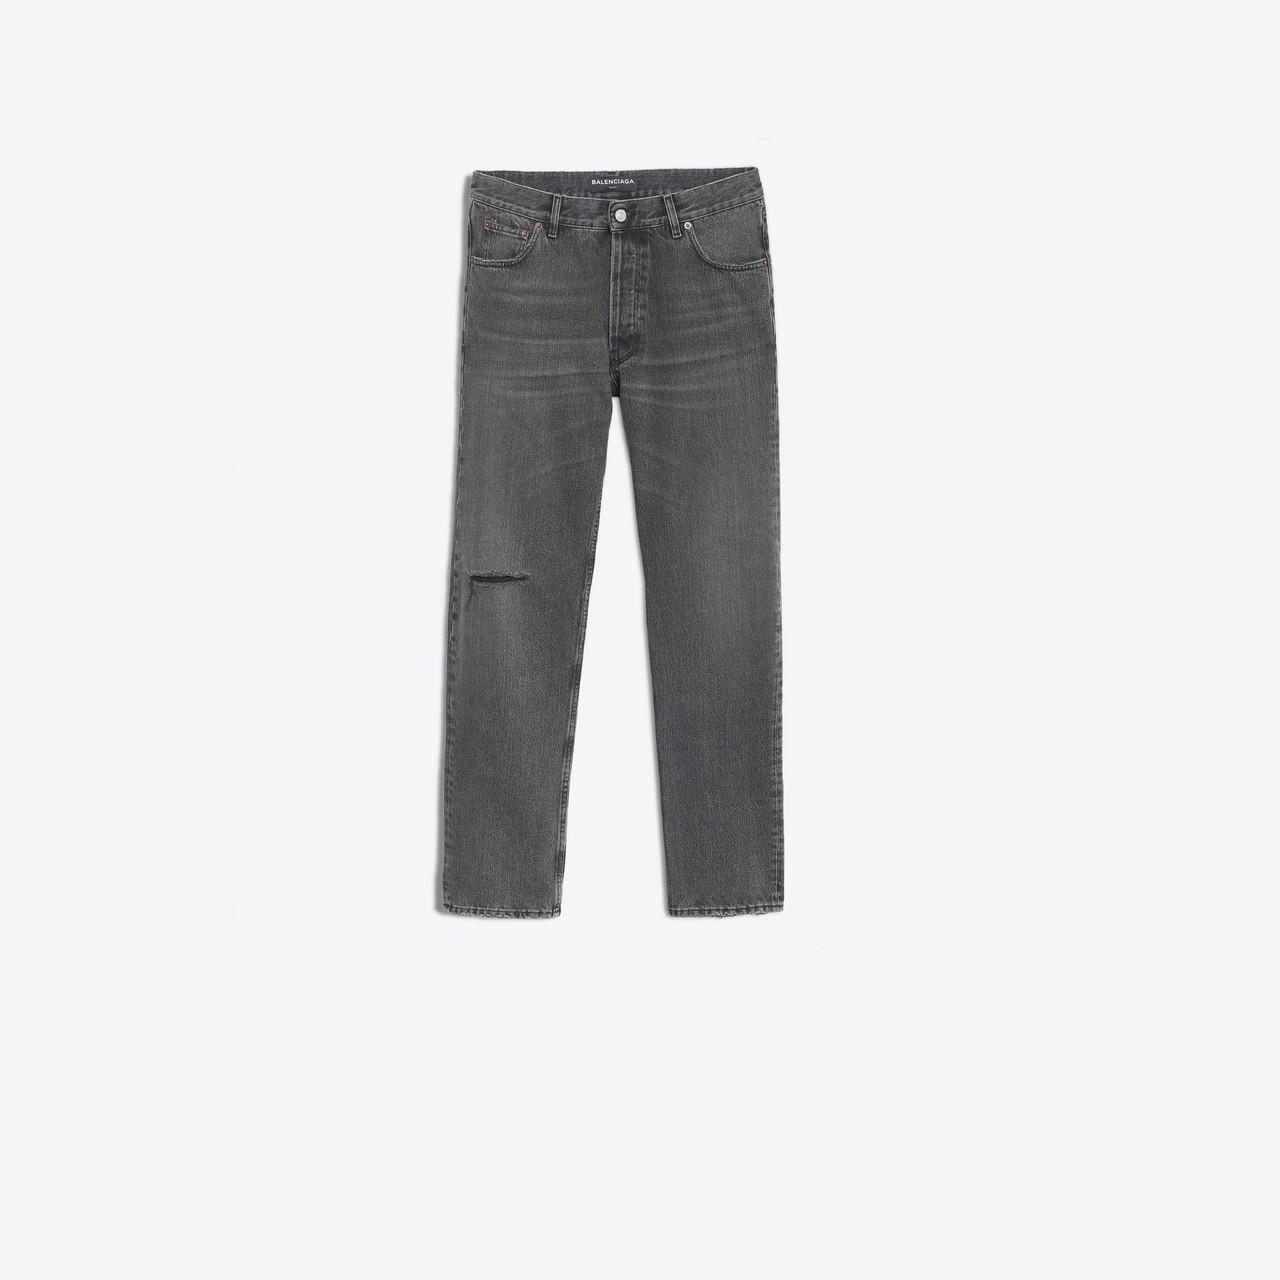 e11ad837a2 Balenciaga - Gray Knee Hole Jeans for Men - Lyst. View fullscreen